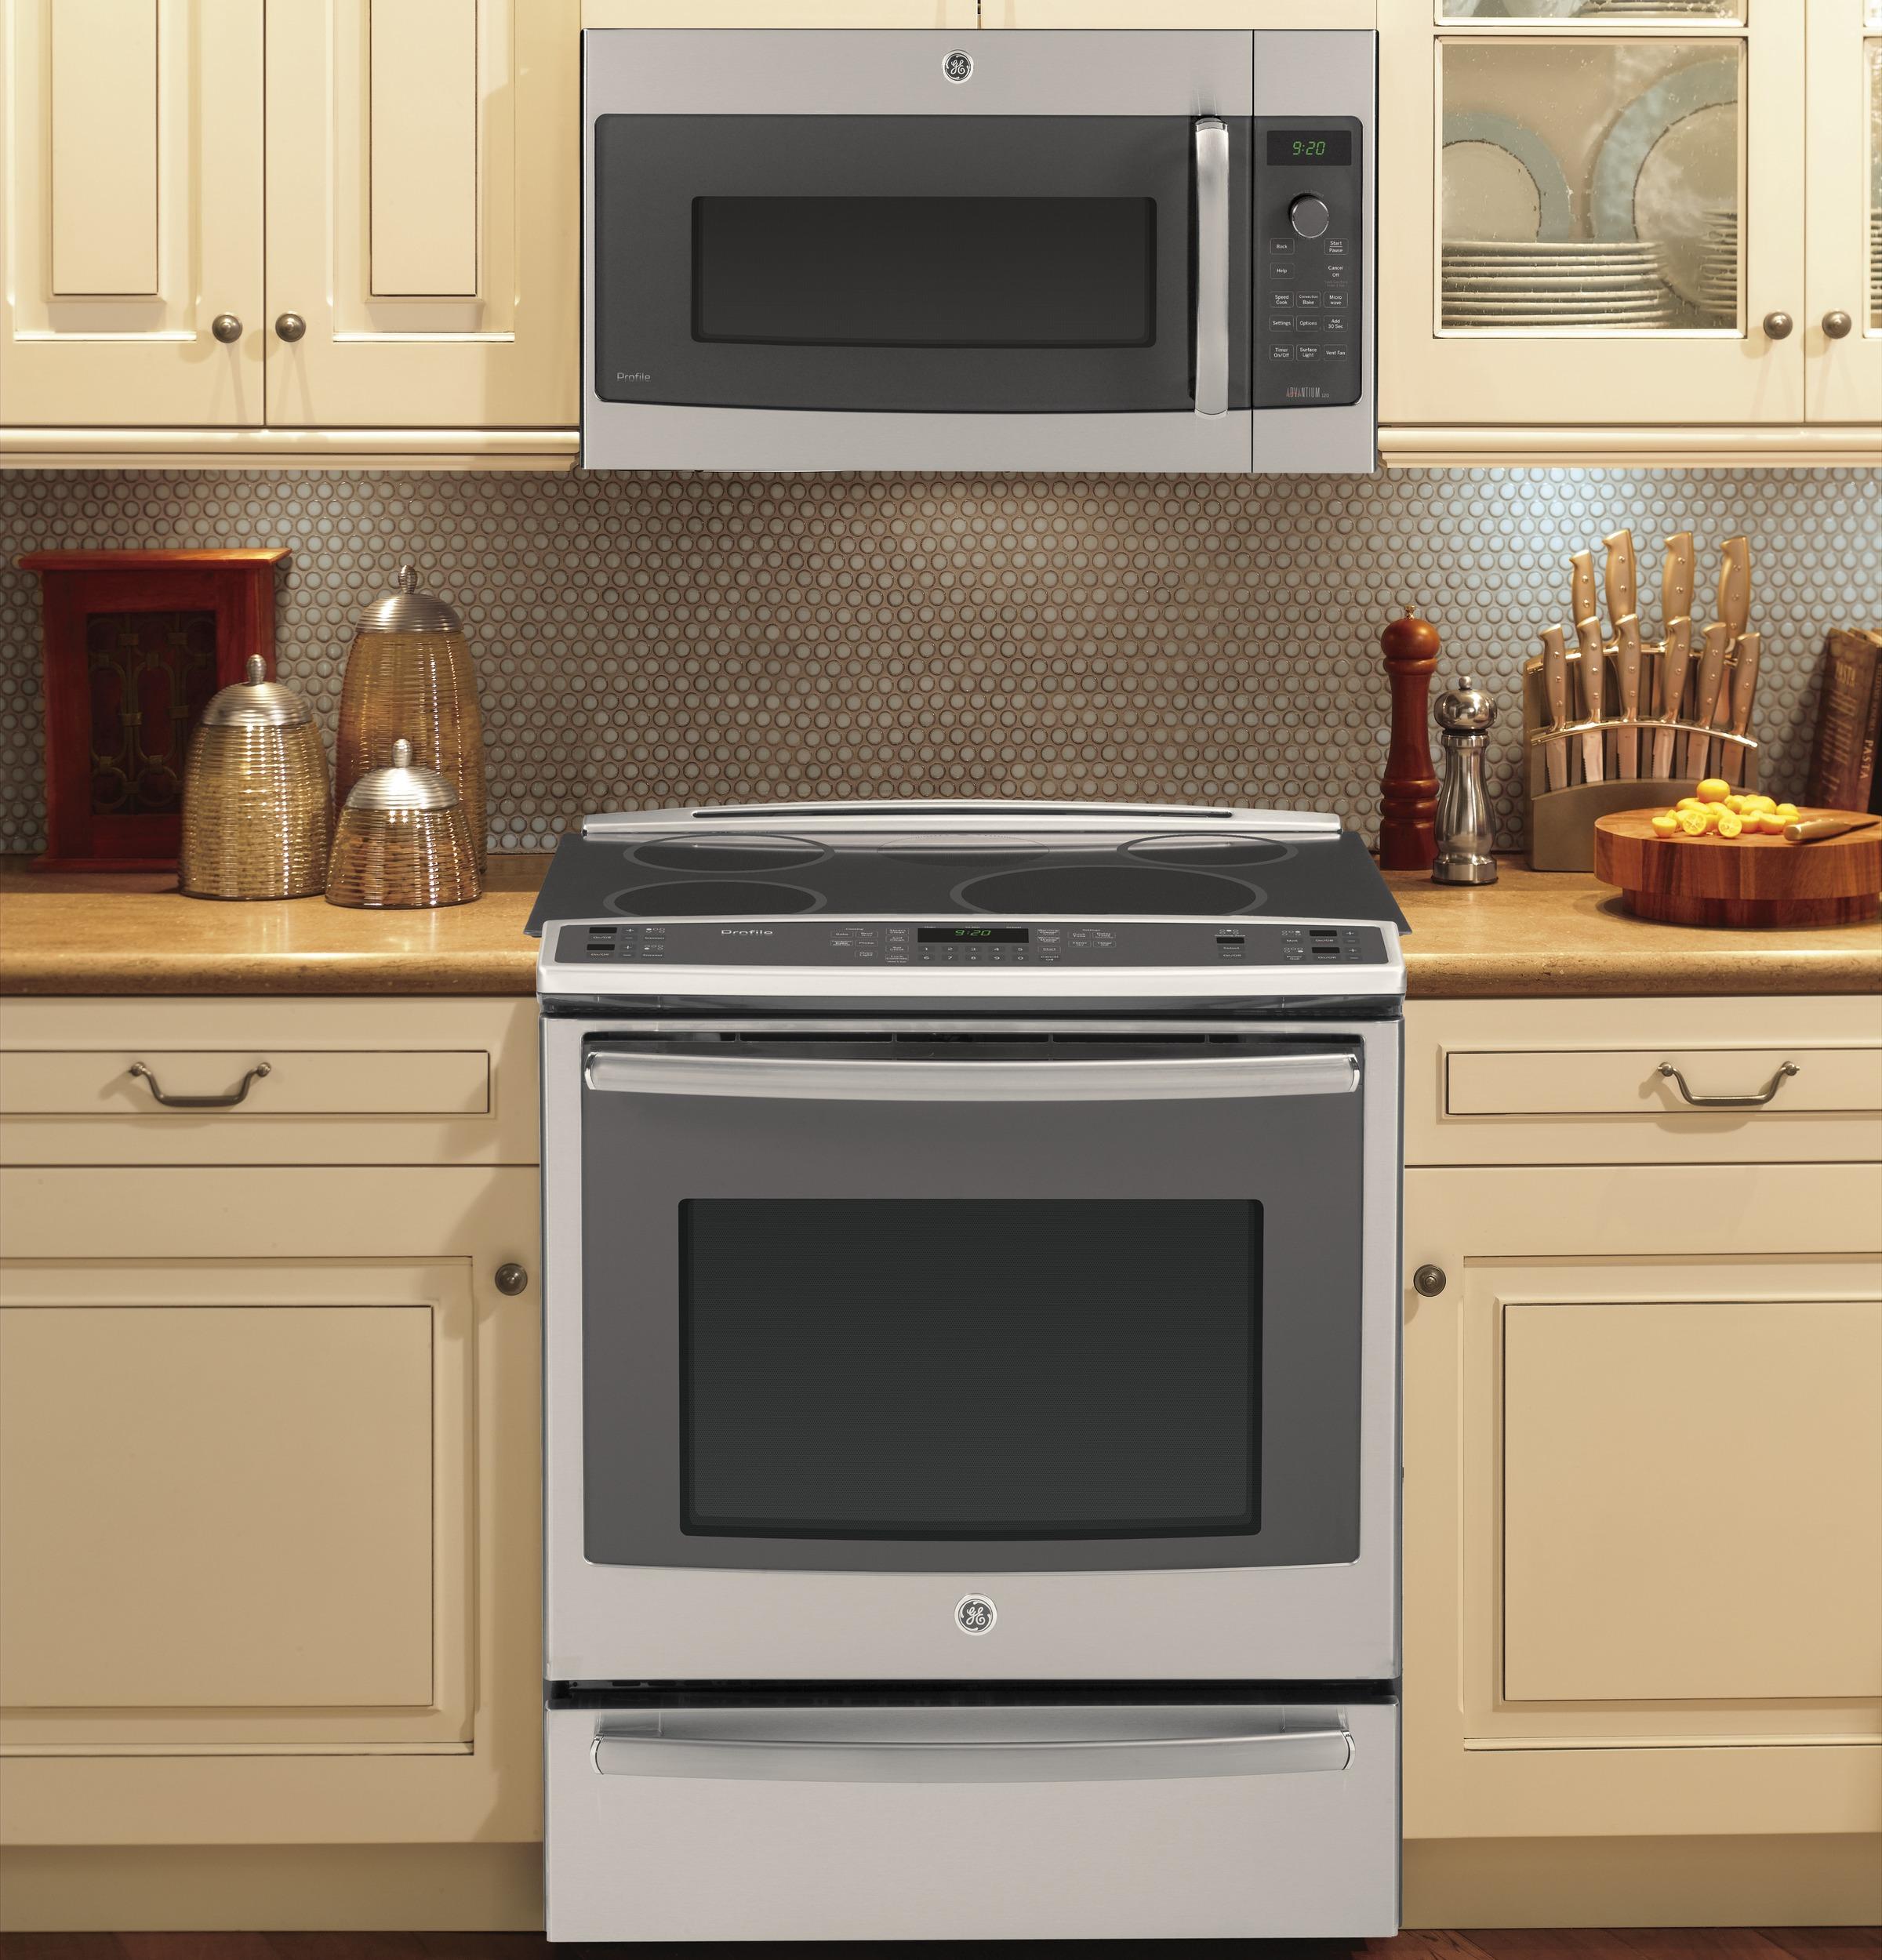 ge profile series advantium 120 1 7 cu ft over the range microwave stainless steel